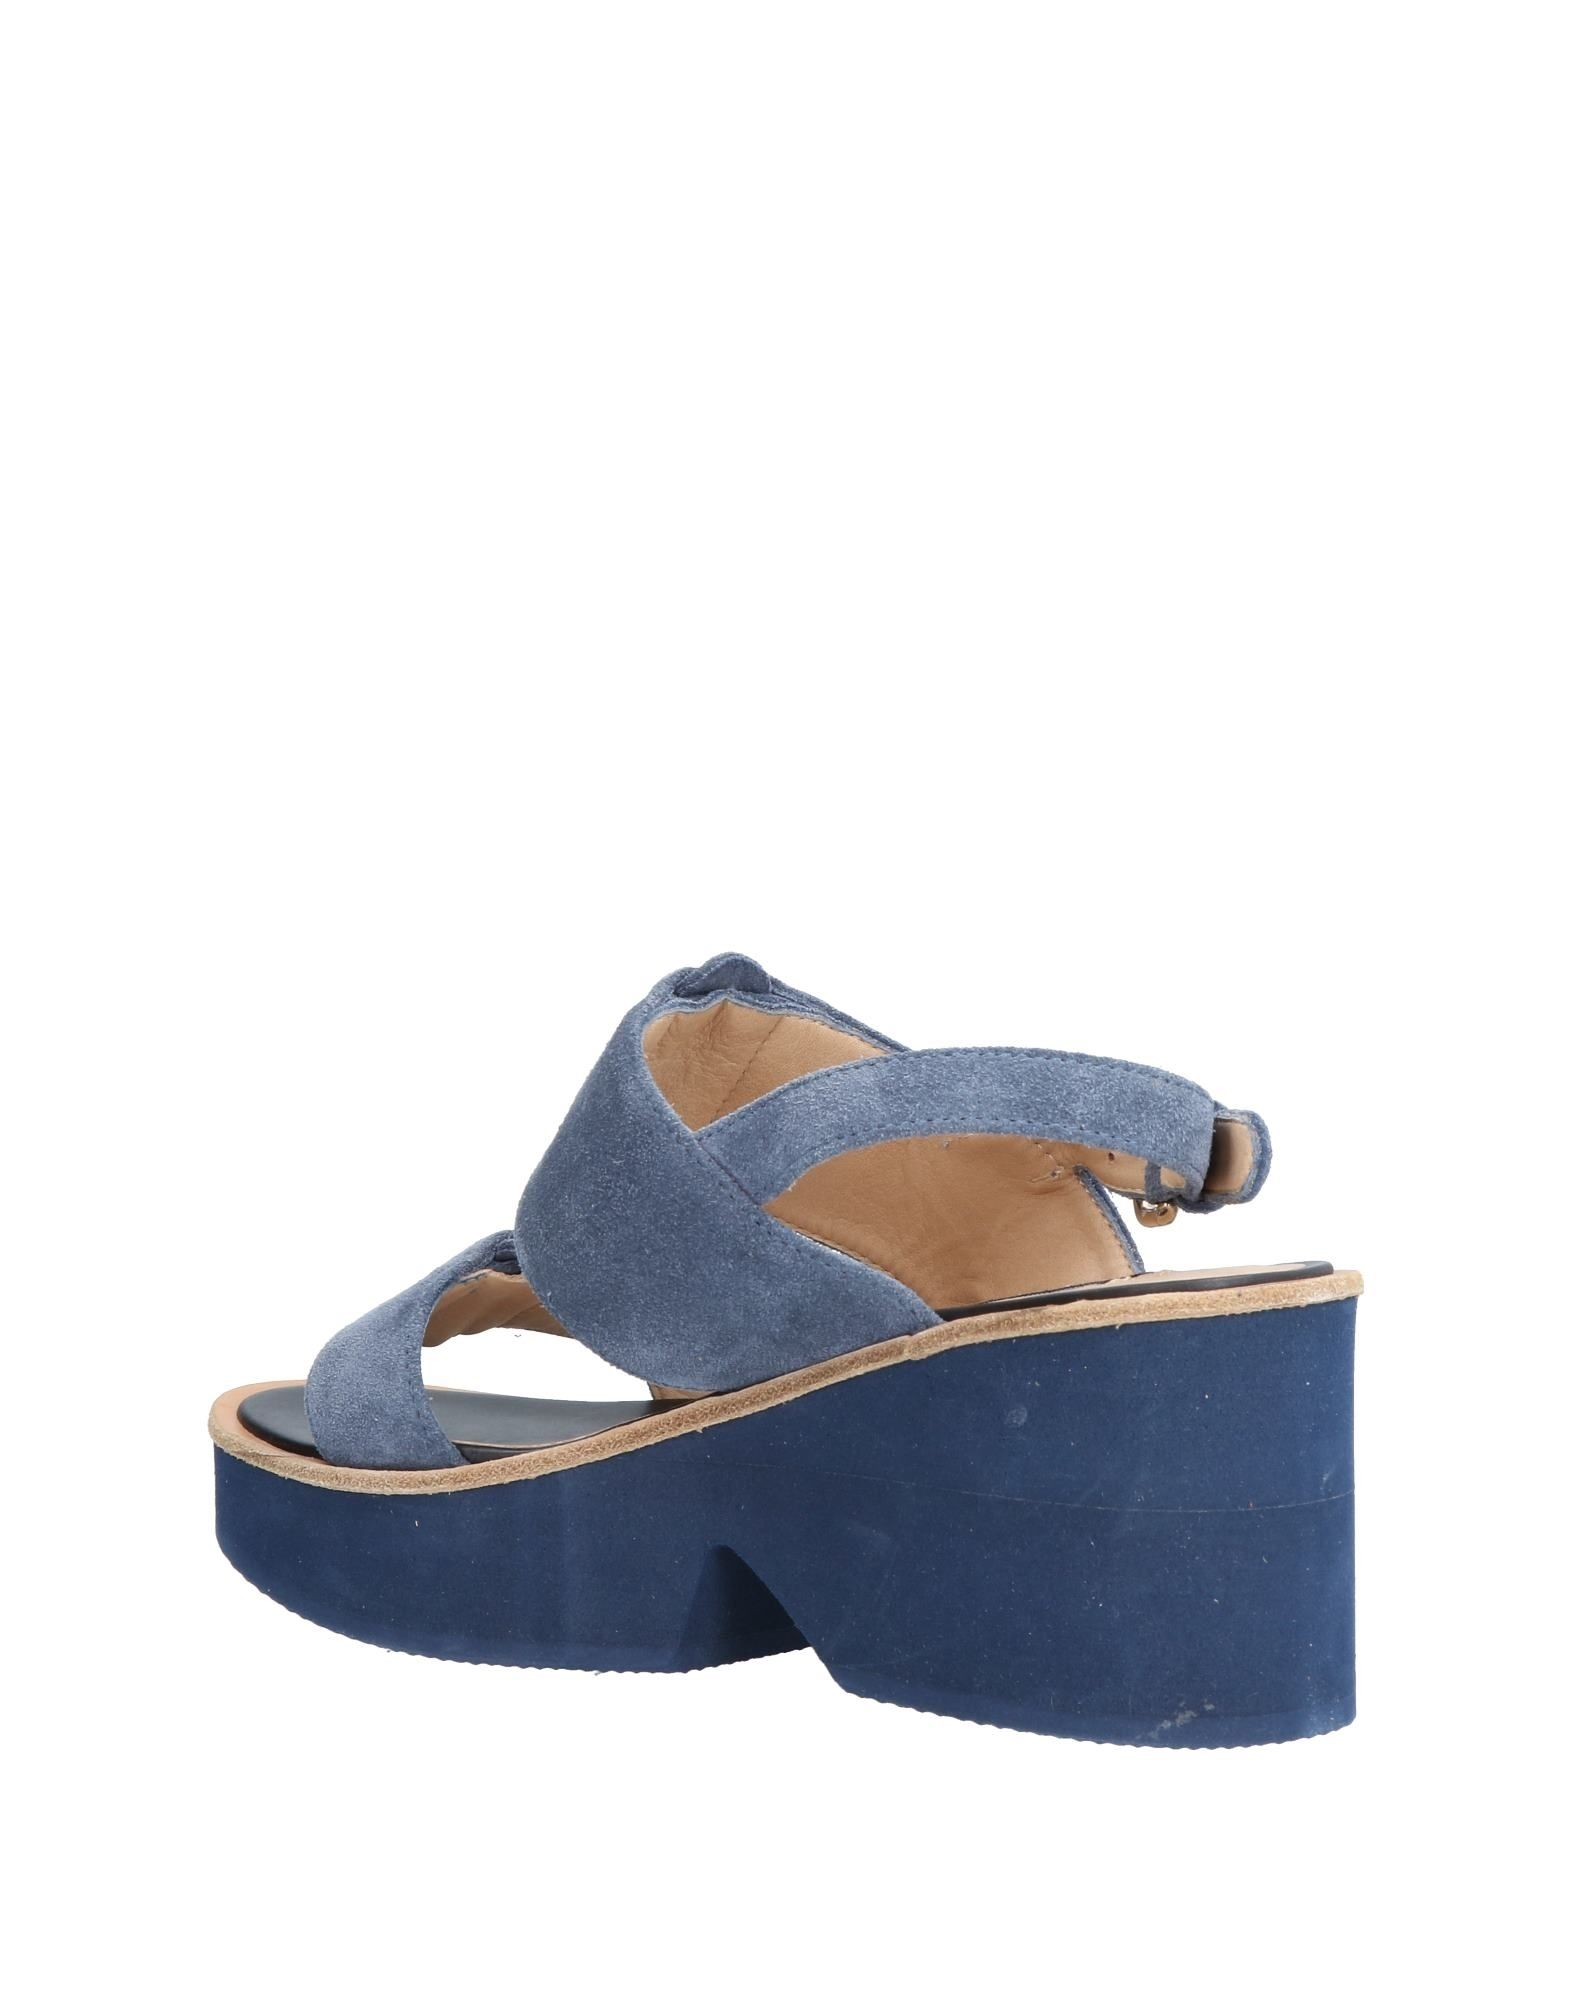 Stilvolle billige Schuhe Fratelli Rossetti Sandalen Damen  11440686TL 11440686TL 11440686TL c3dc3c